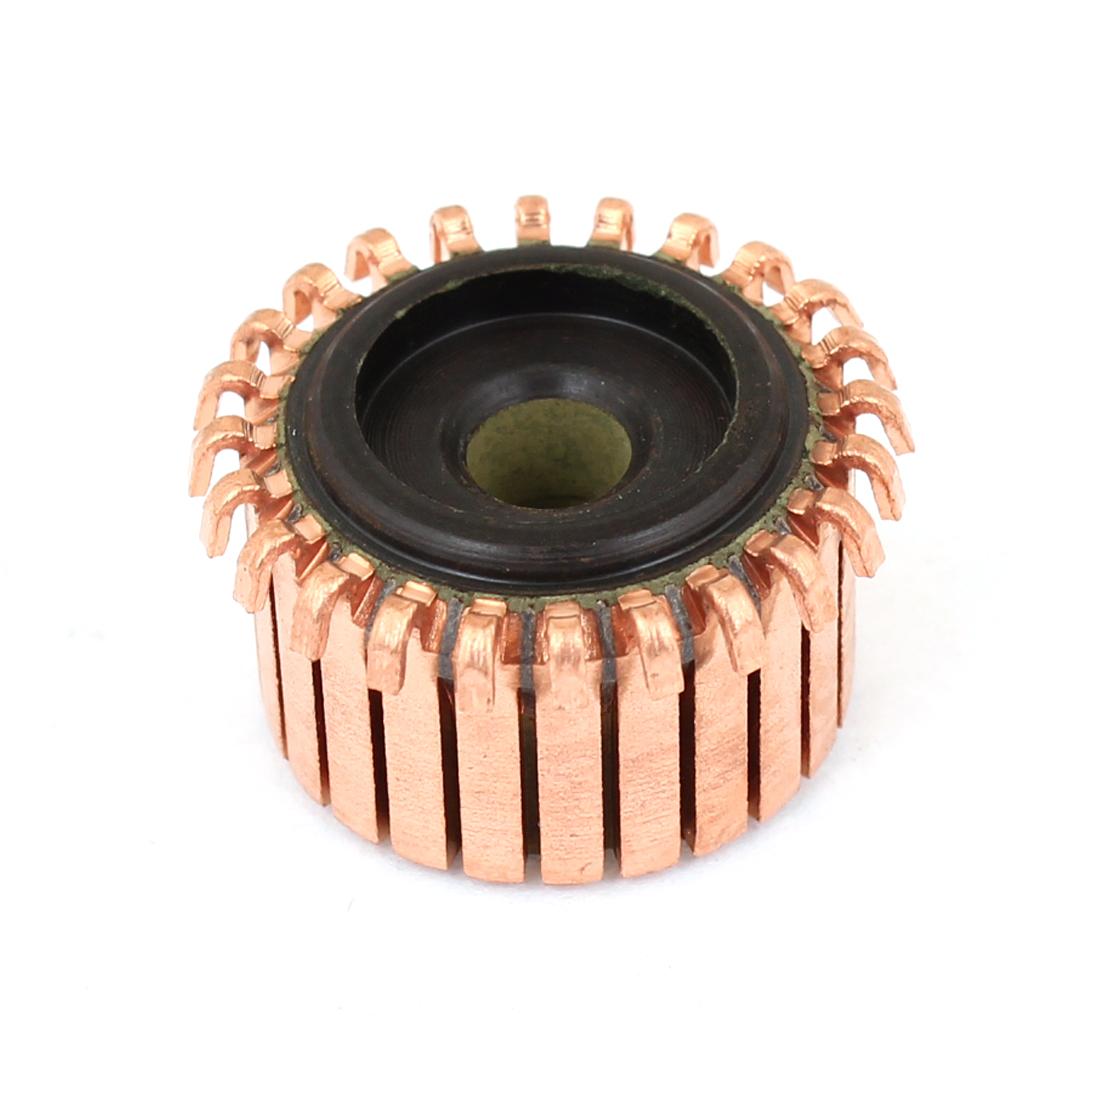 5mm Shaft Dia 18.9mm OD 24 Pcs Tooth Copper Shell Electric Motor Commutator